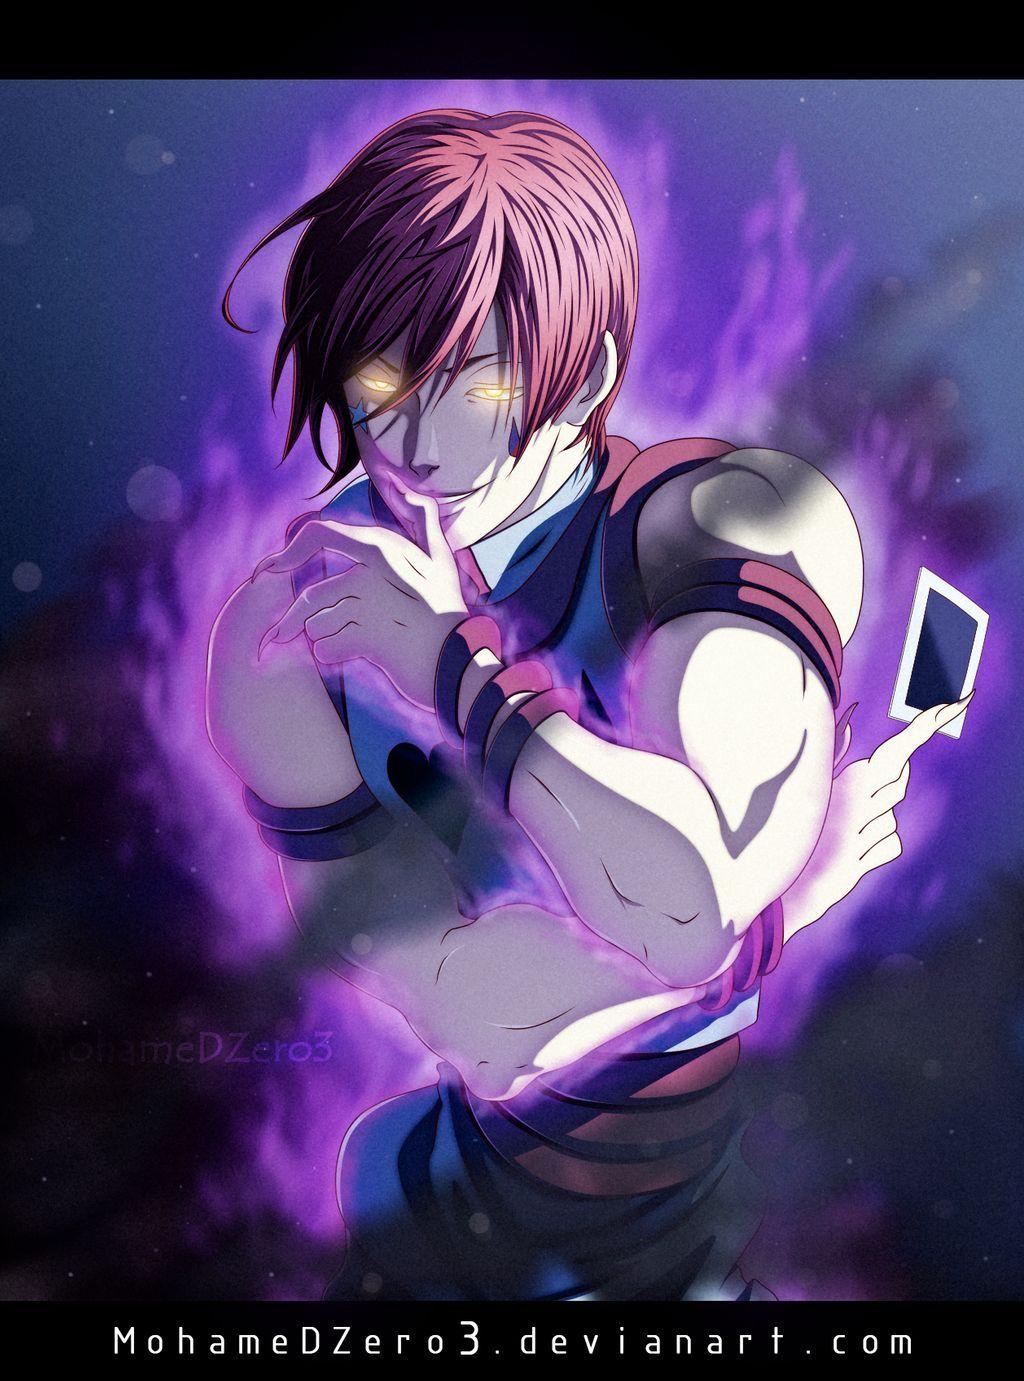 Hxh Coloring Hisoka By Mohamedzero3 On Deviantart Hunterxhunter Hisoka Hunter Anime Hunter X Hunter